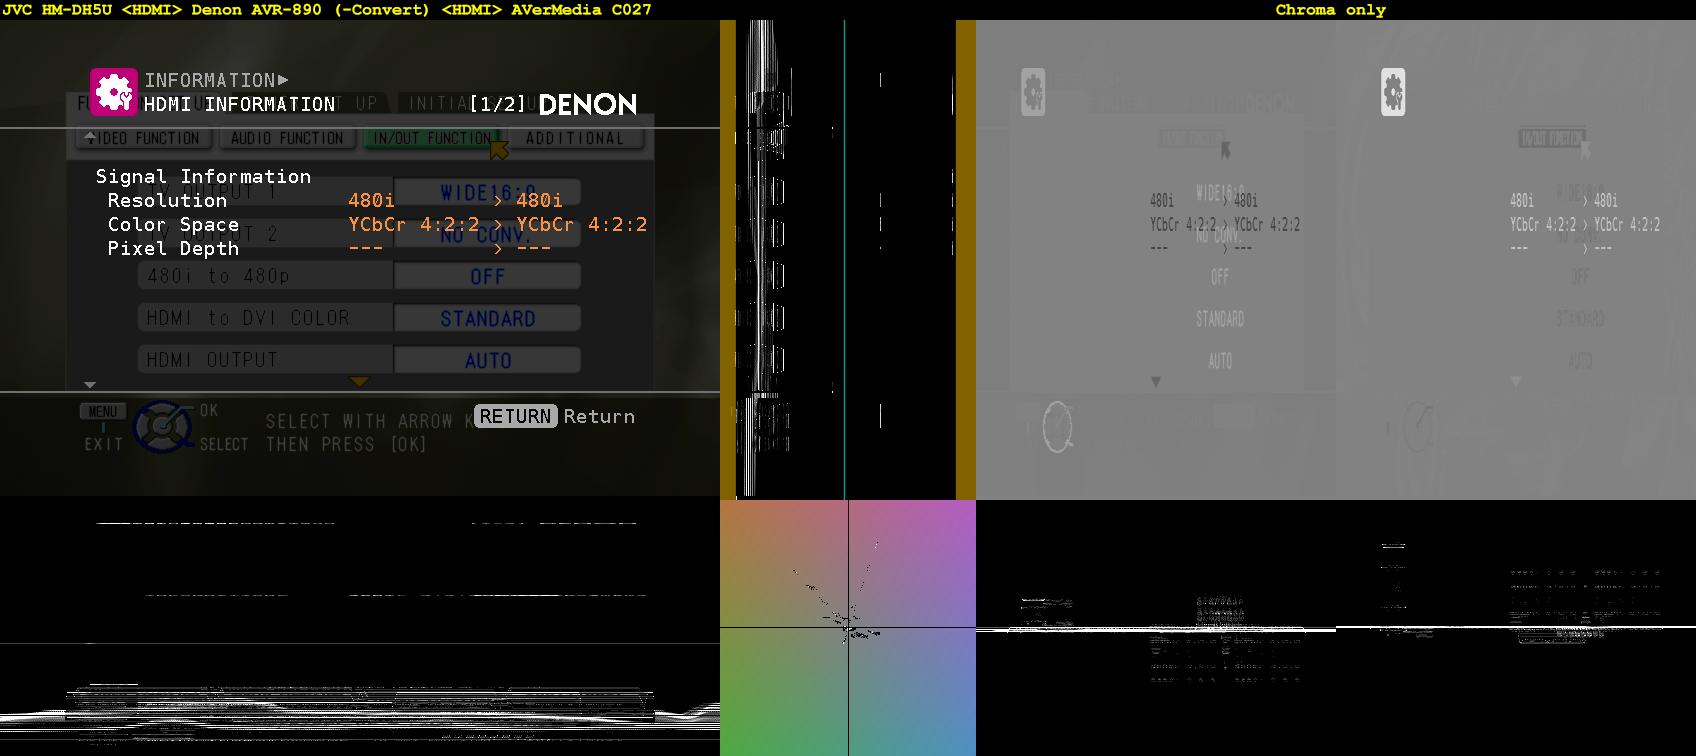 Click image for larger version  Name:Menu + Info - JVC HM-DH5U =HDMI= Denon AVR-890, -Convert =HDMI= AVerMedia C027.png Views:3323 Size:270.9 KB ID:35267